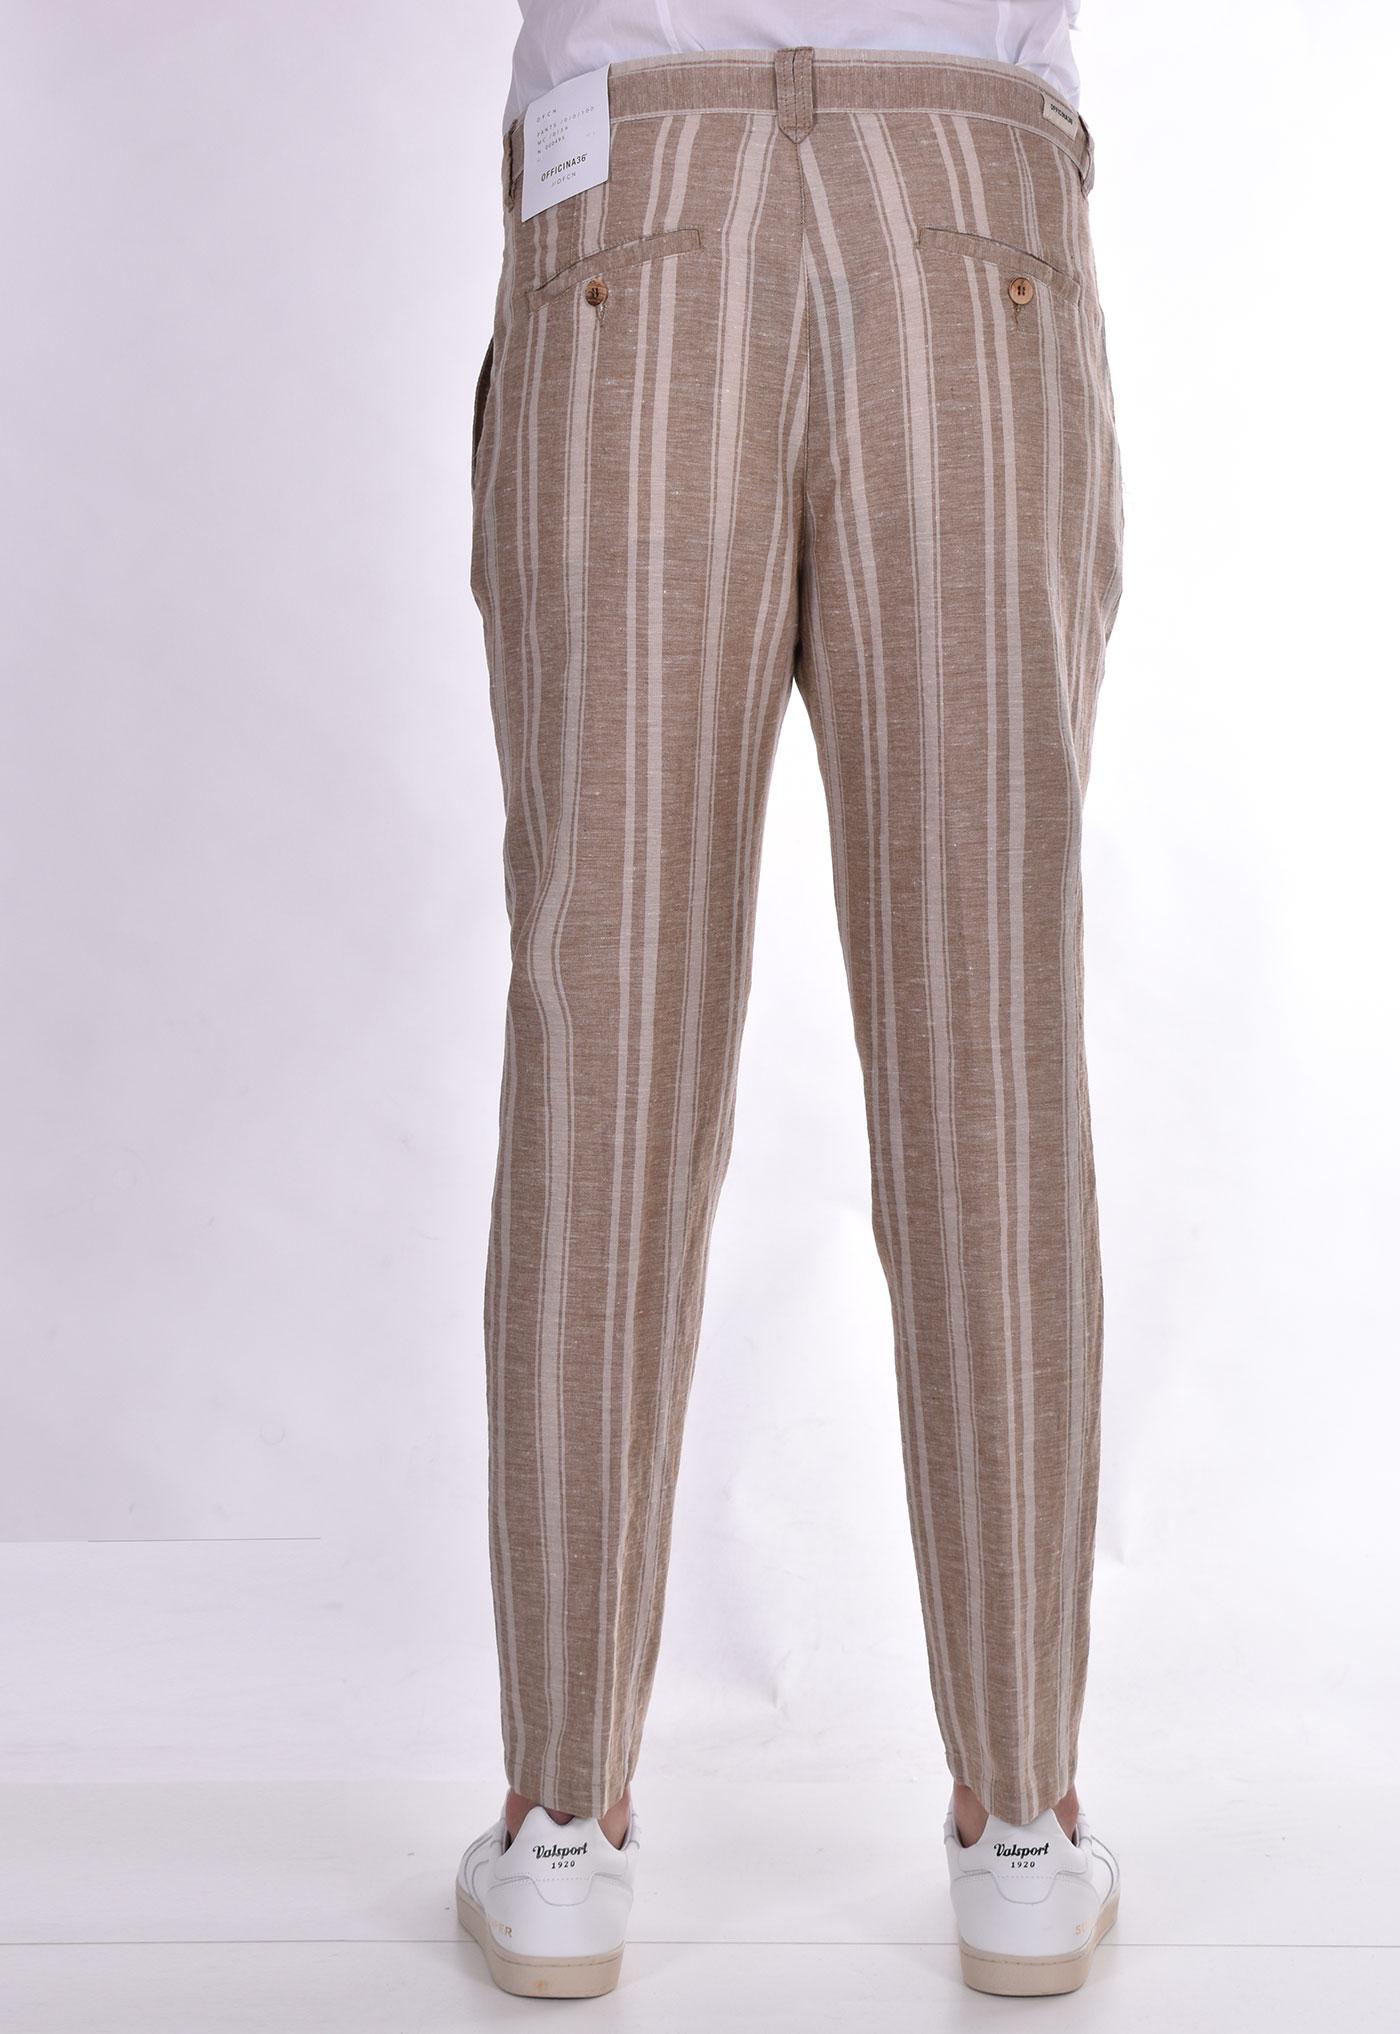 Officina trousers 36 lines beige linen OFFICINA 36 | 2822TP1